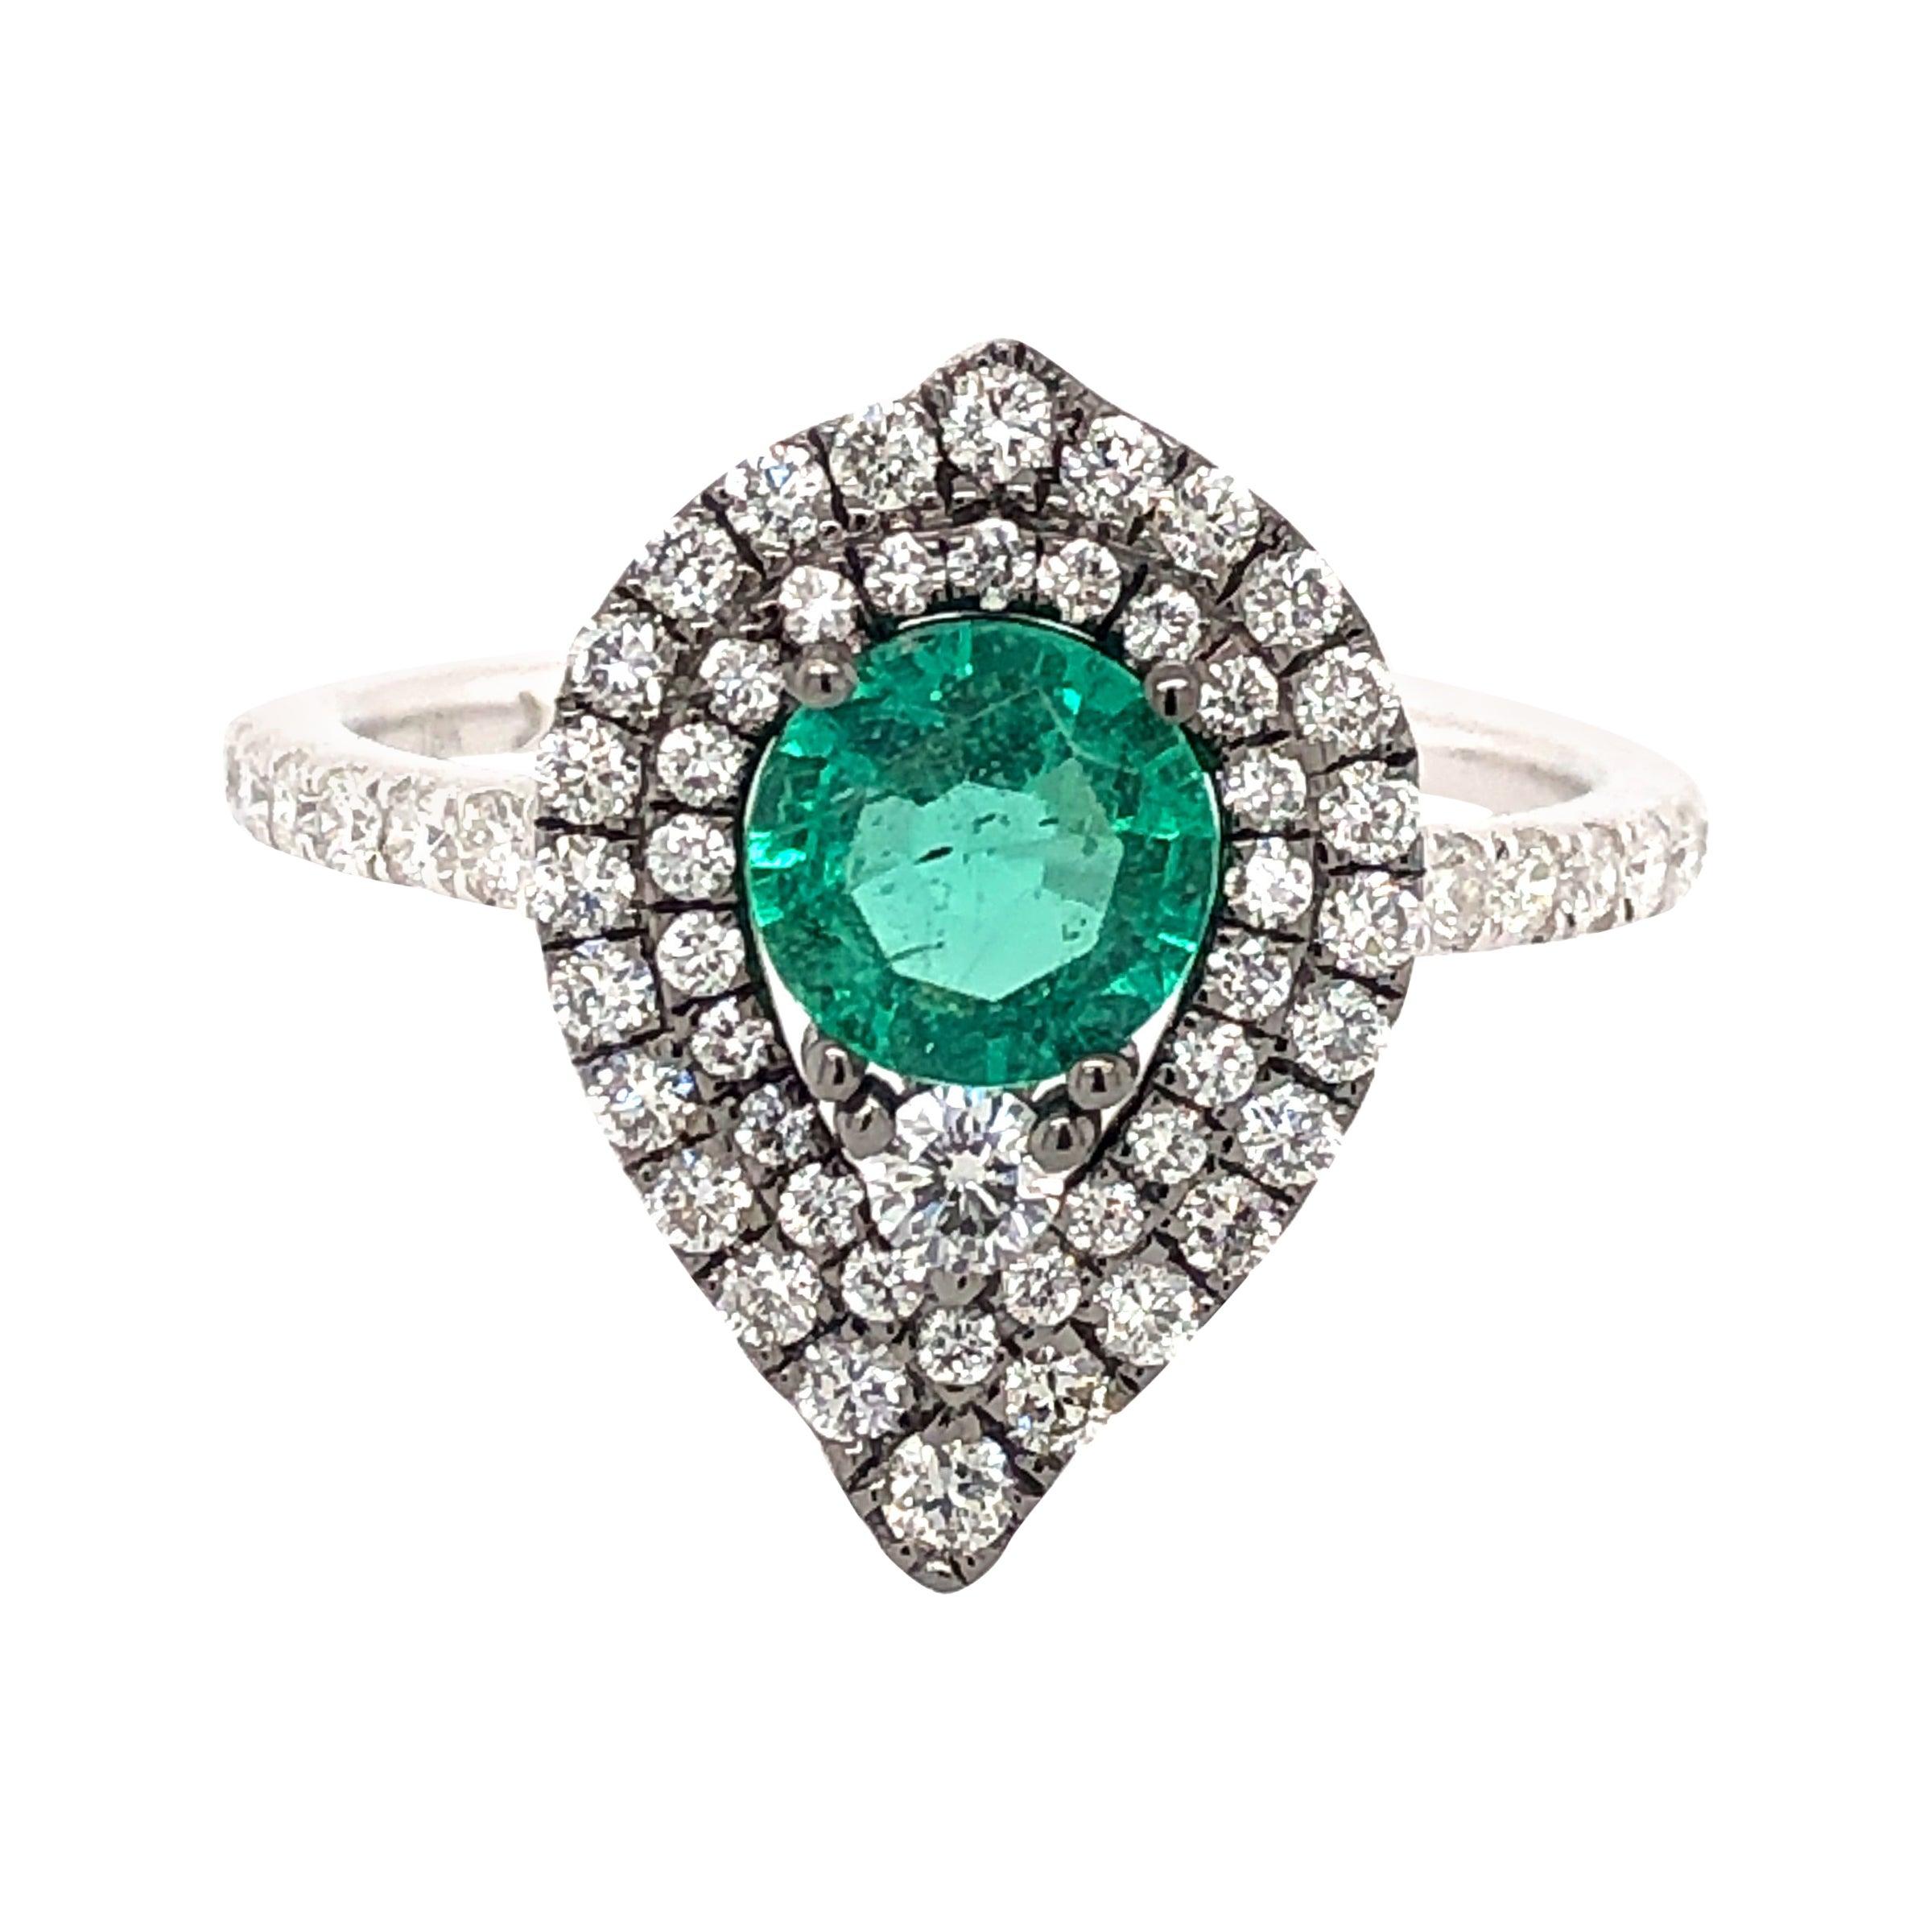 0.63 Carat Emerald and Diamond Ring